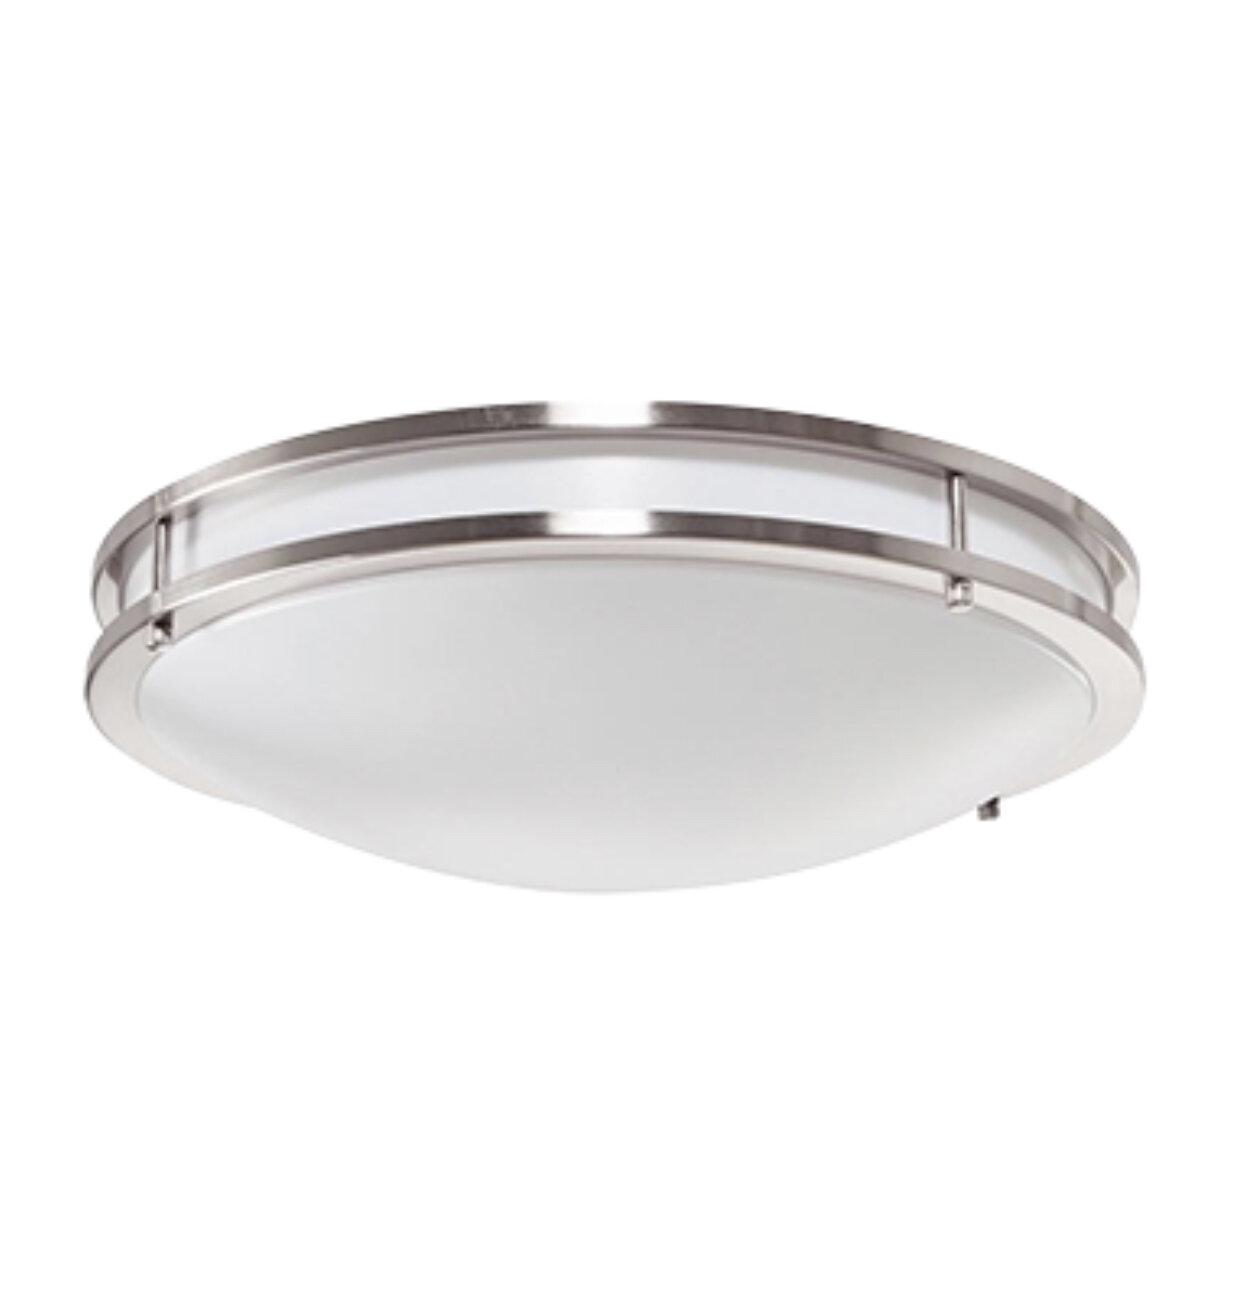 13W LED Satin Nickel Ringed Ceiling Light